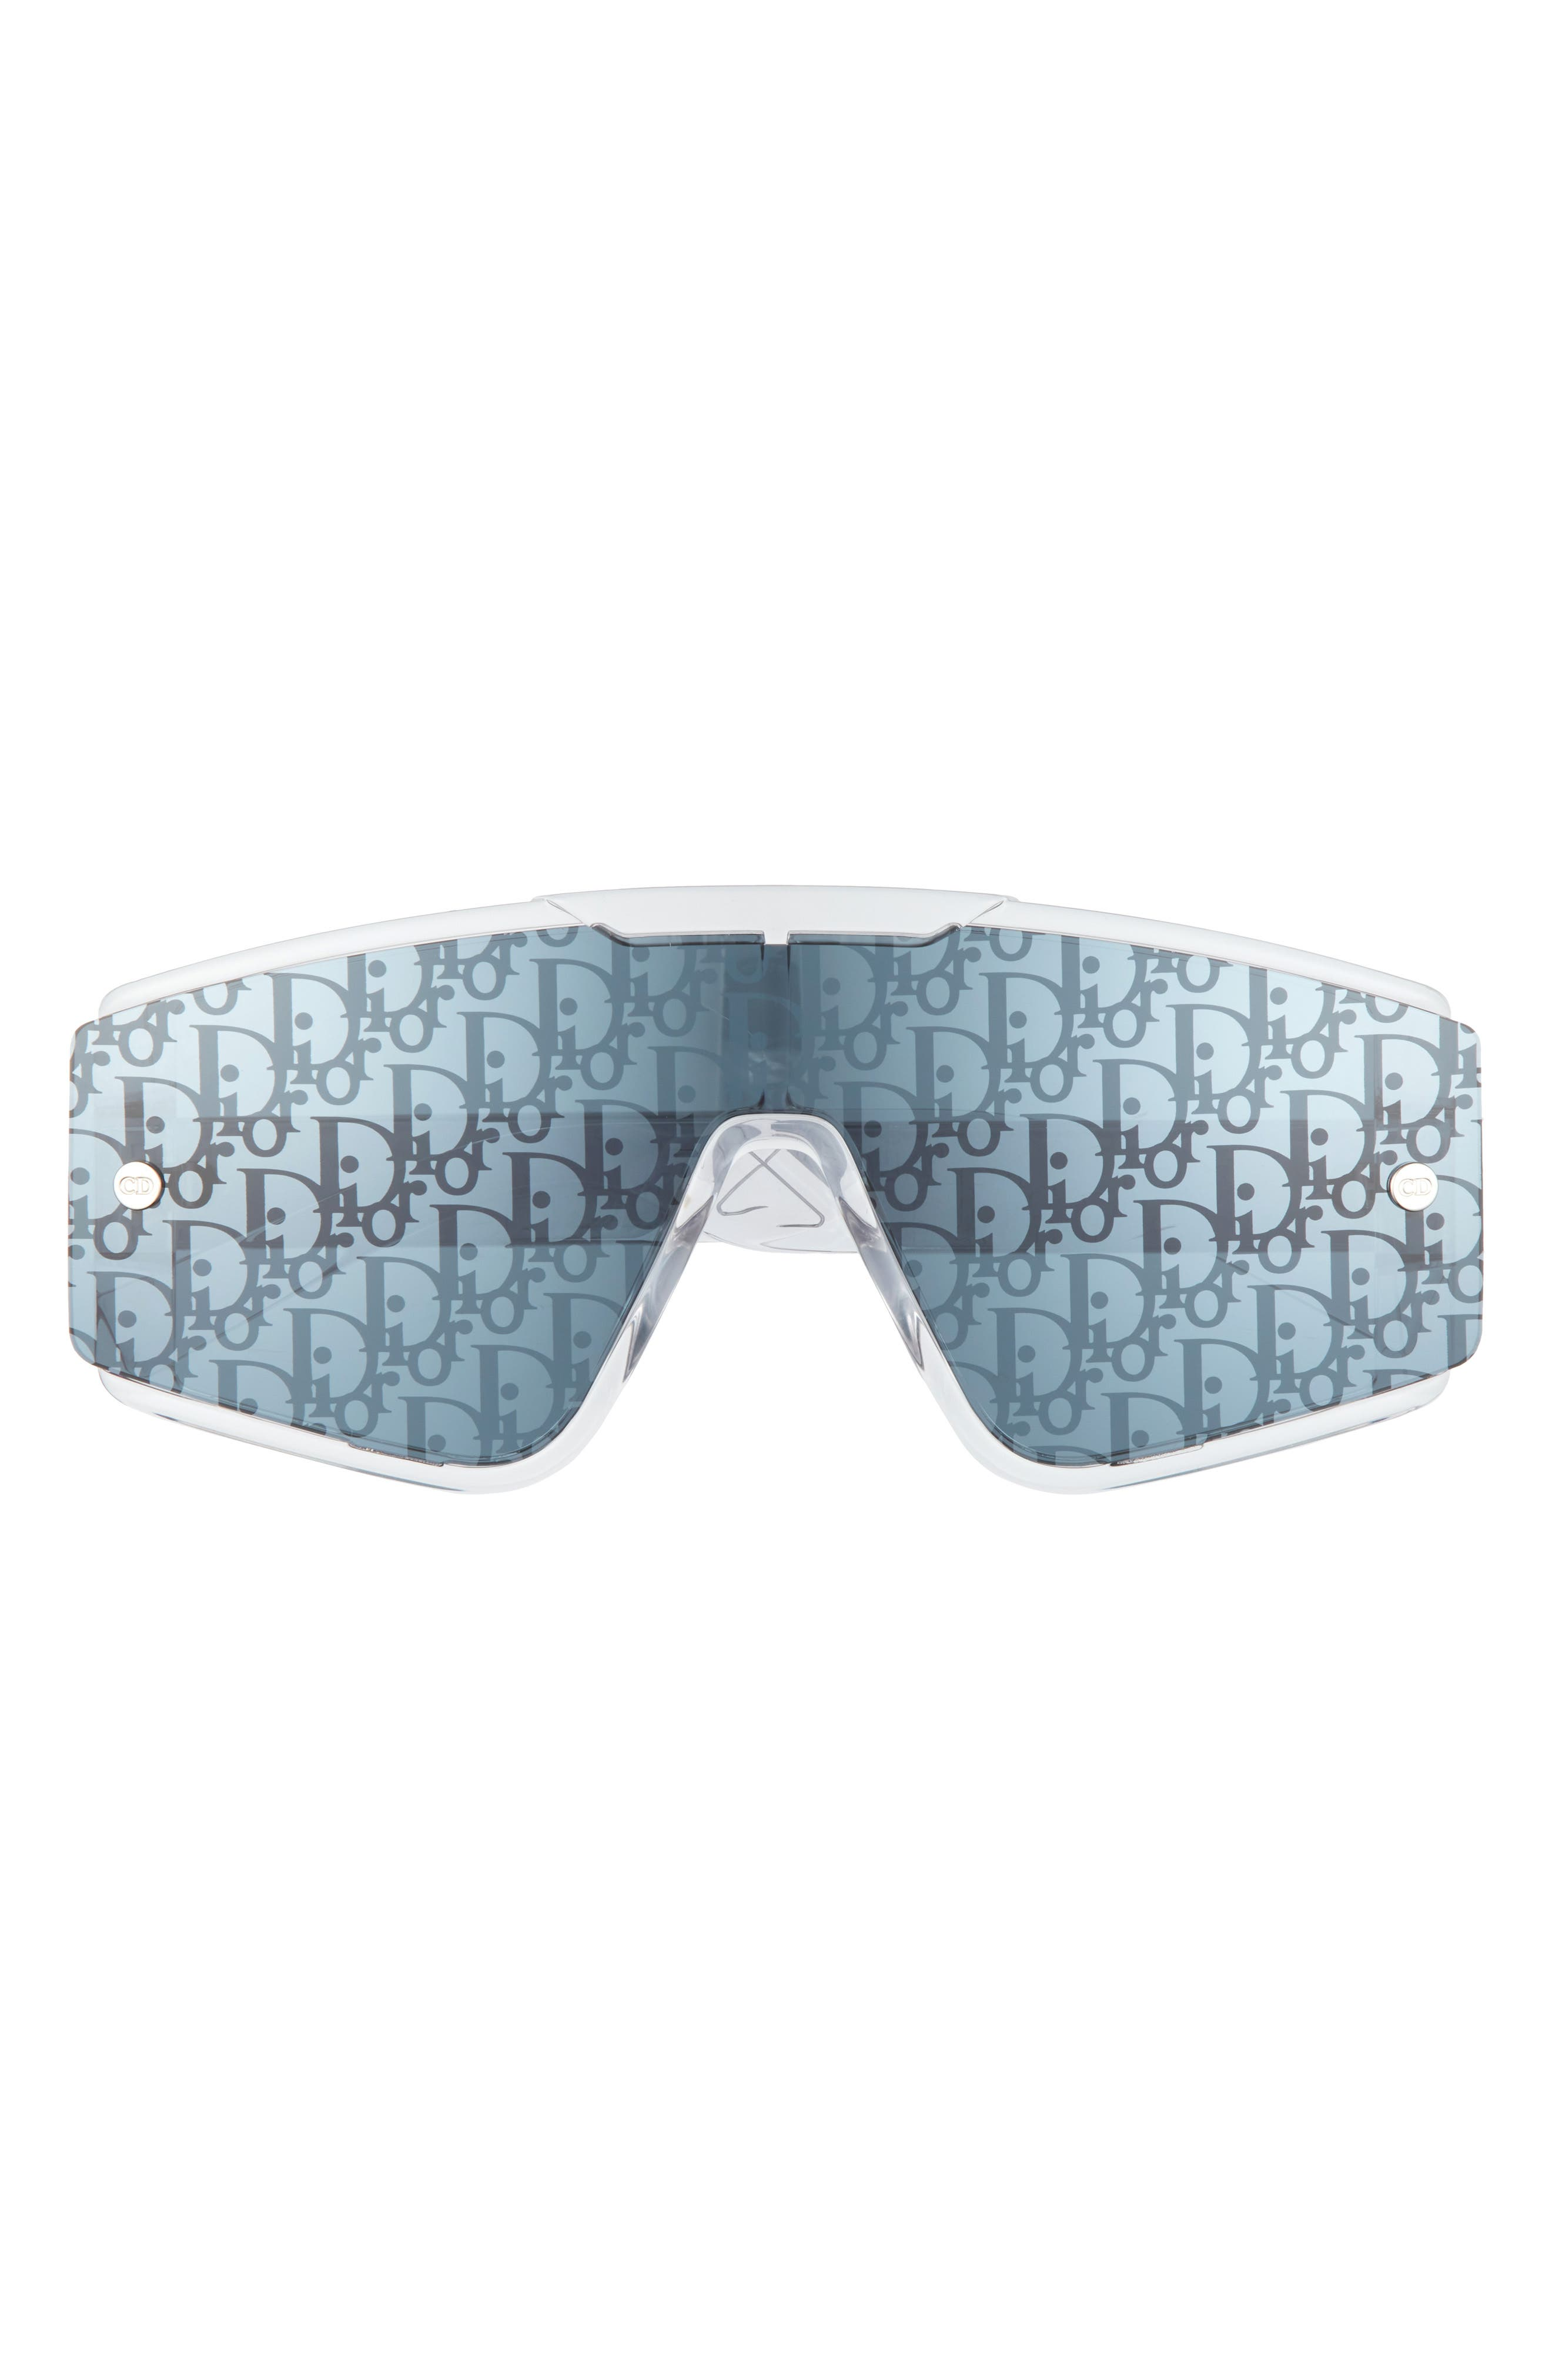 Dual Lens Shield Sunglasses